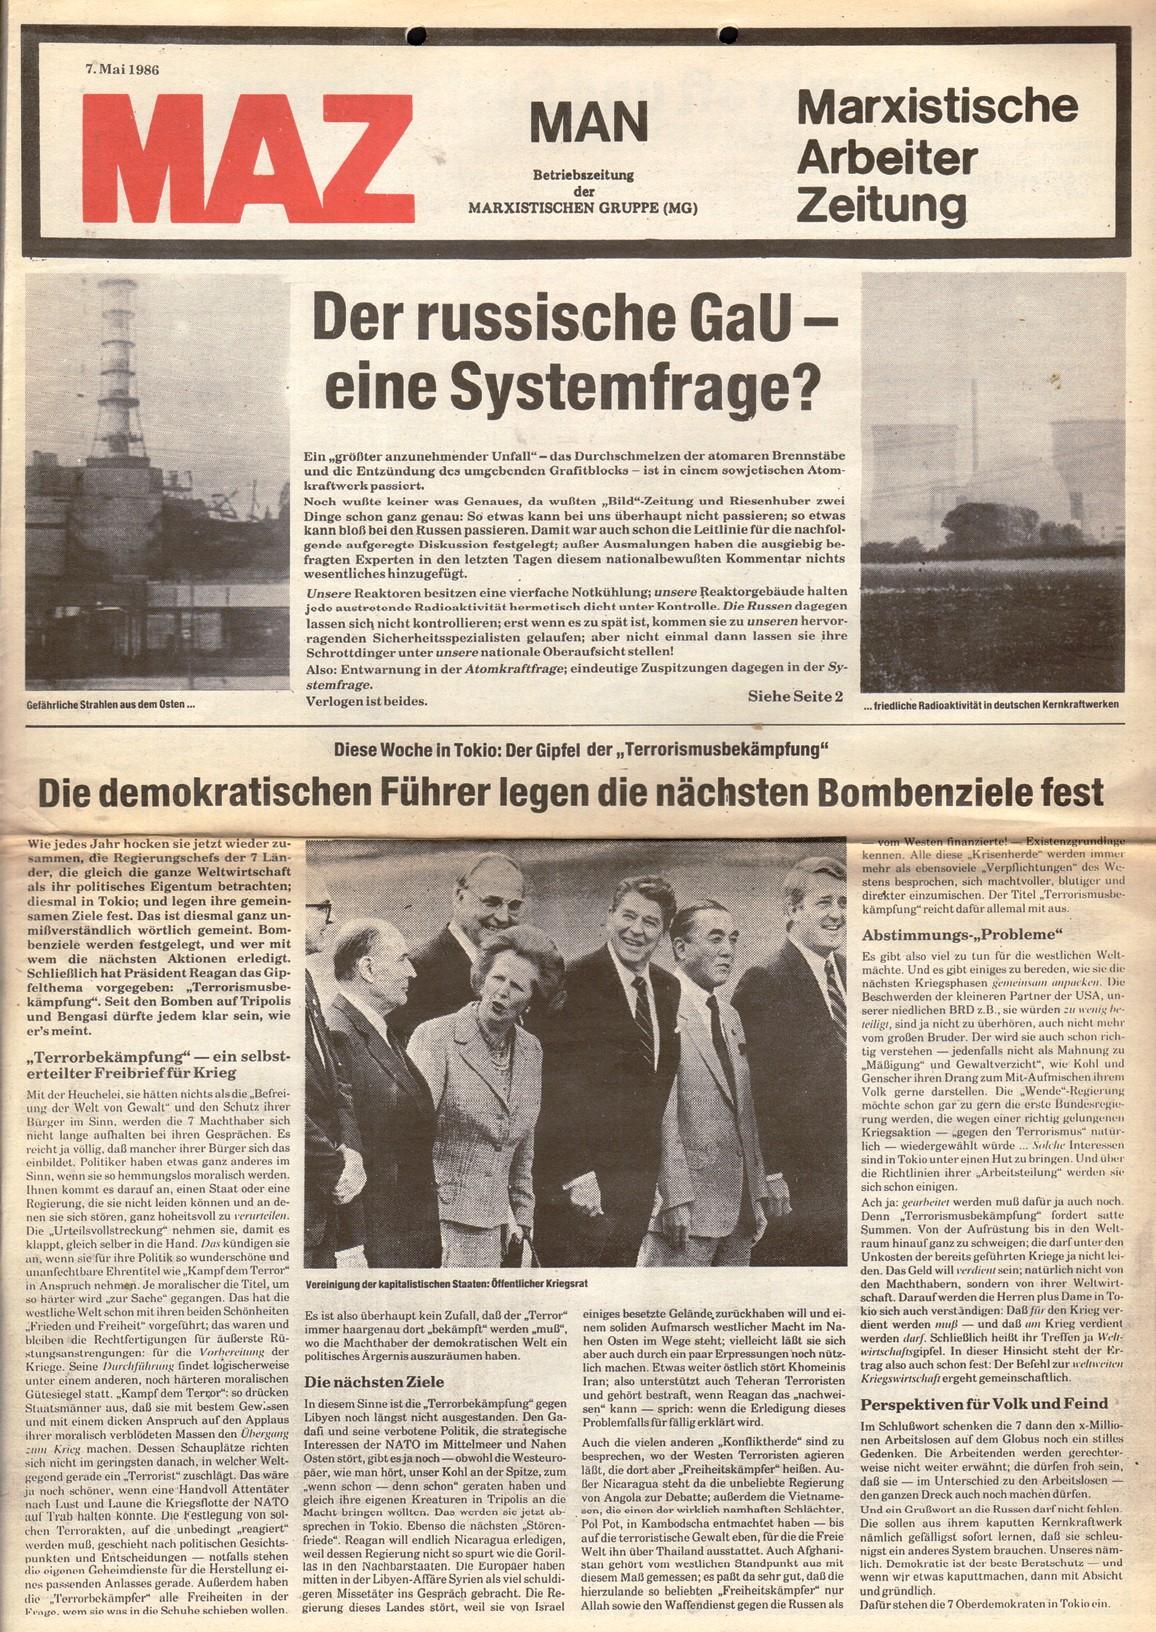 Muenchen_MG_MAZ_MAN_19860507_01